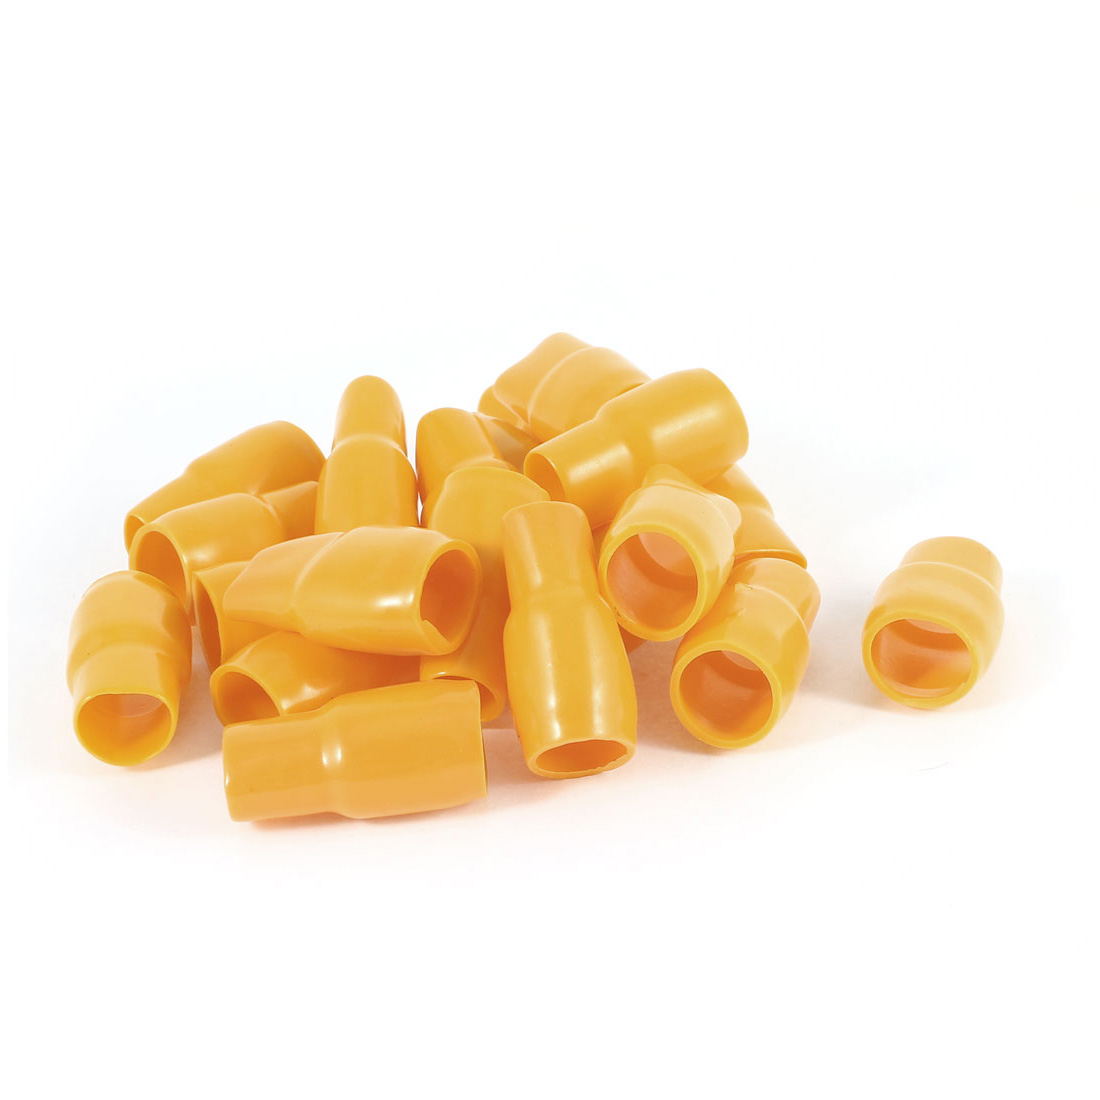 20 Pcs Orange Soft PVC Wire V-60 50mm2 Crimp V Terminal End Insulated Sleeves Caps Cover